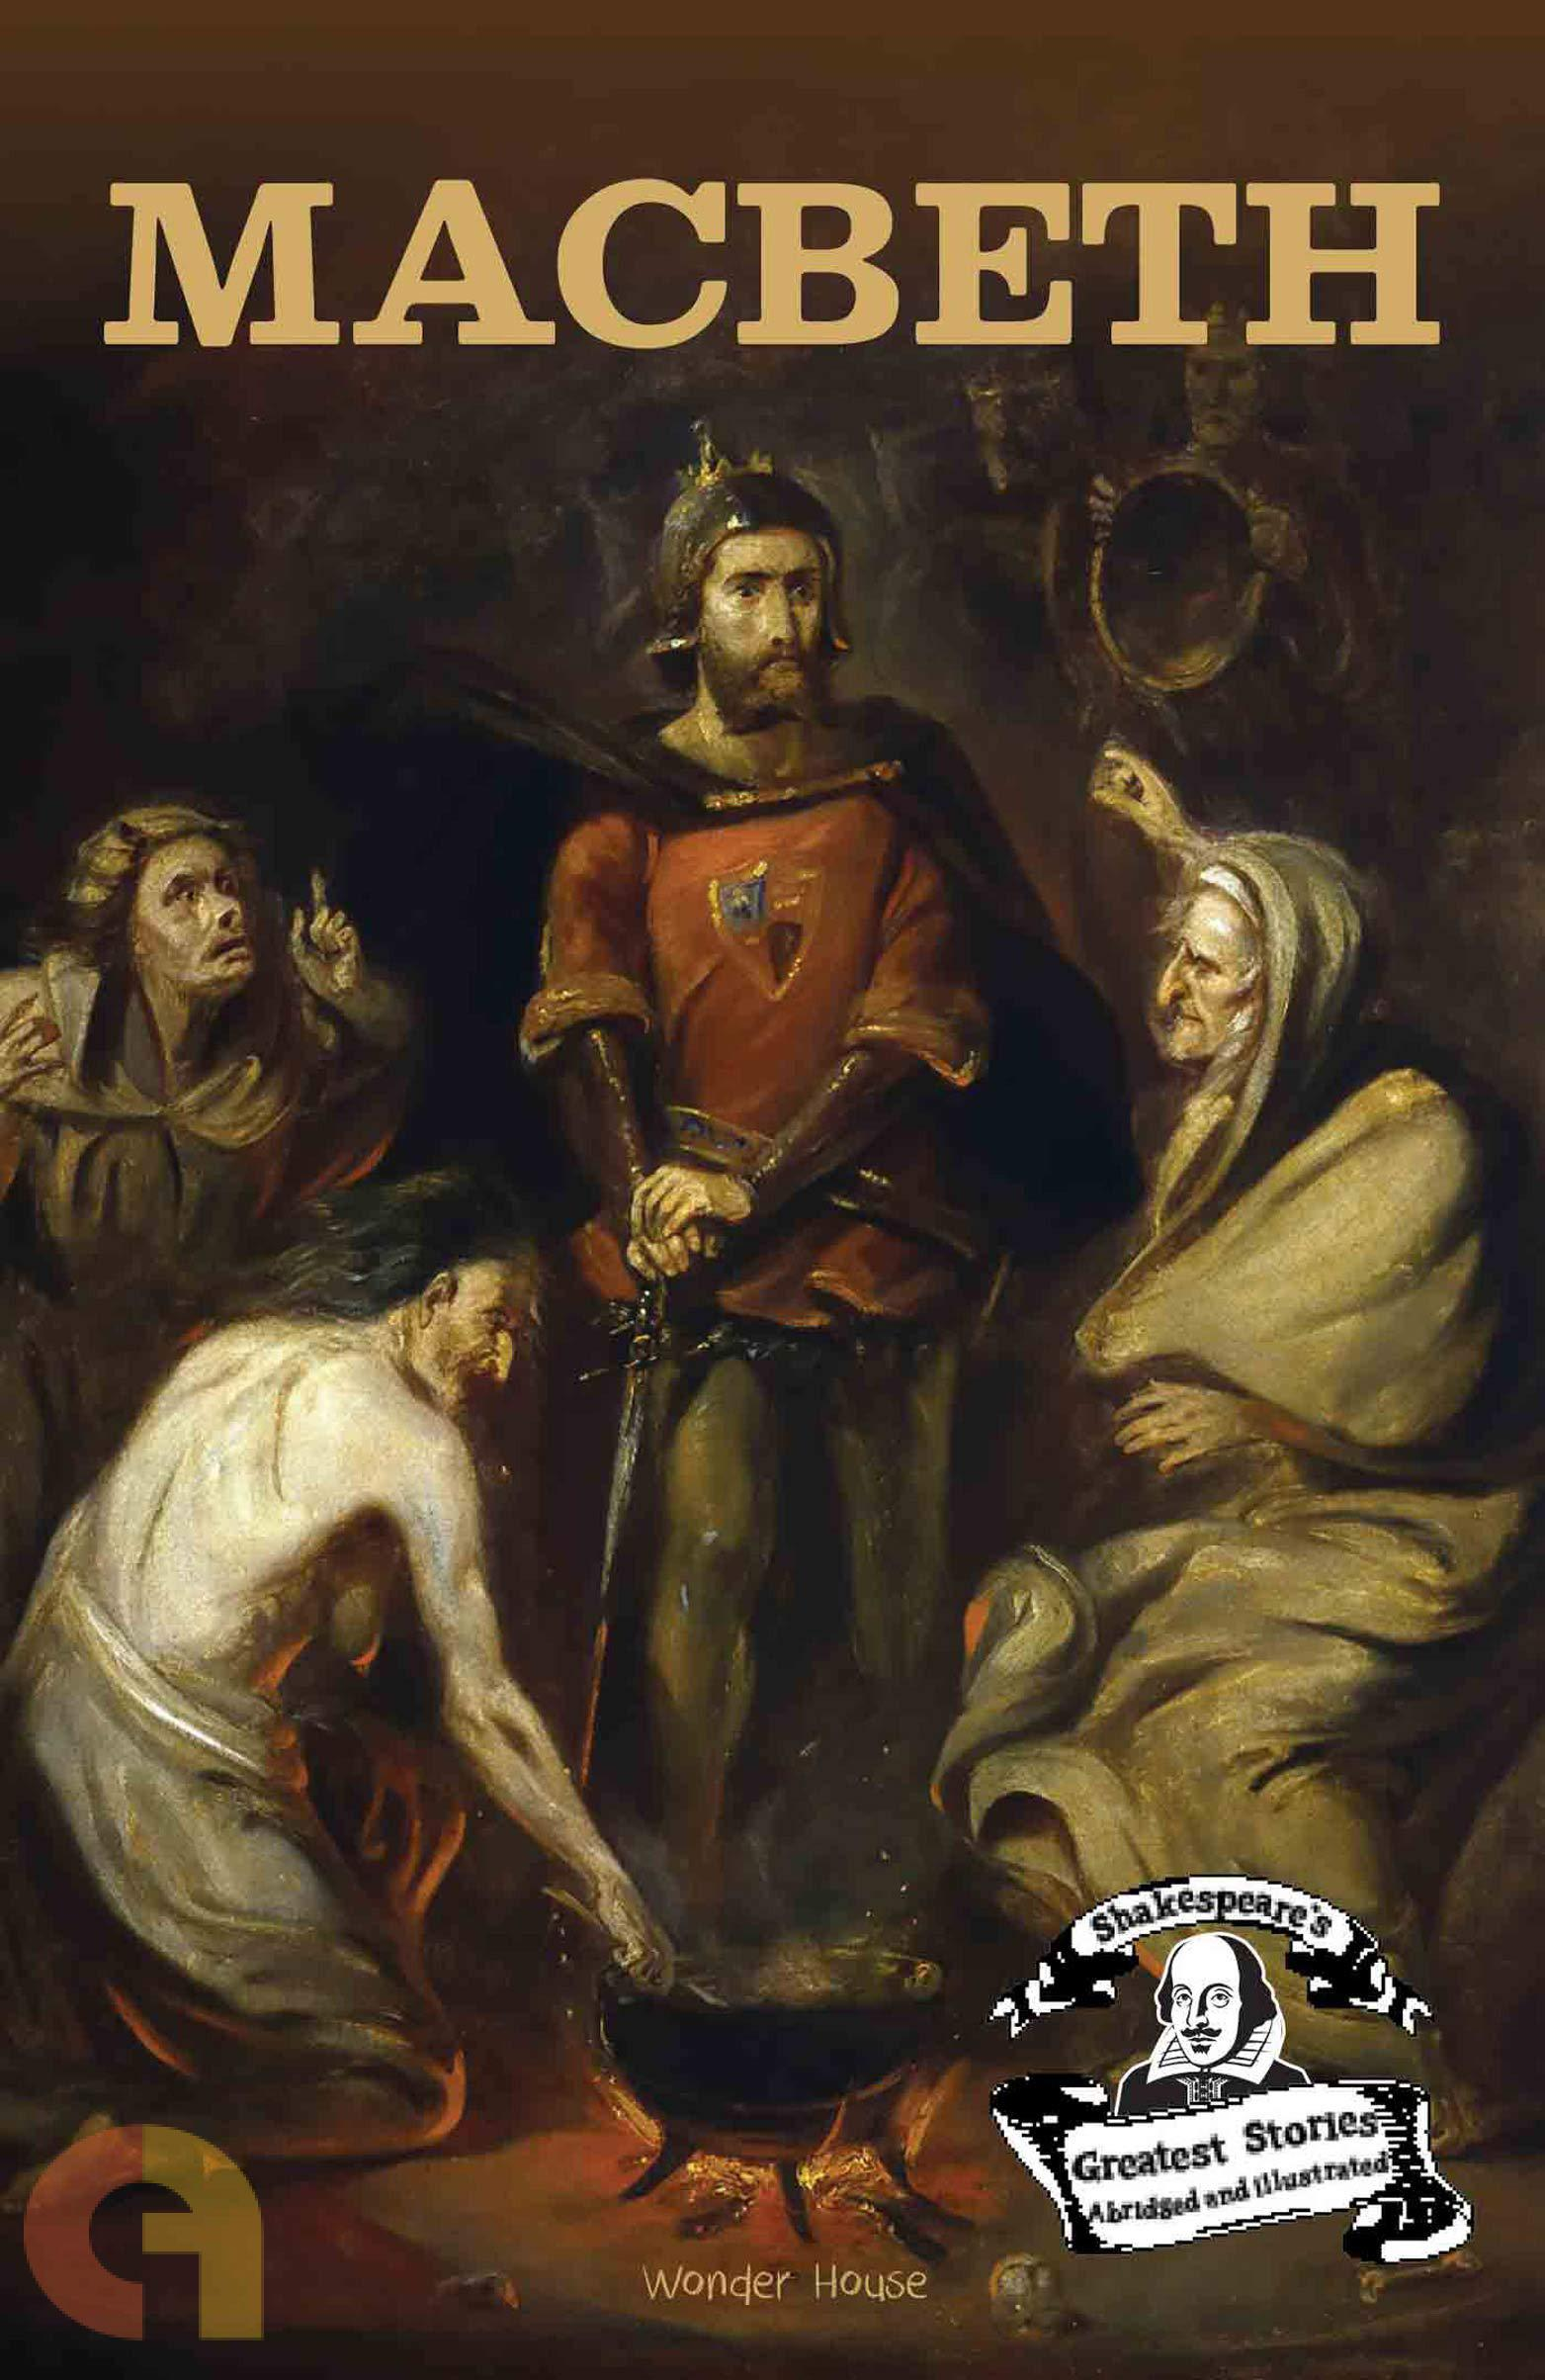 Macbeth: Shakespeare's Greatest Stories